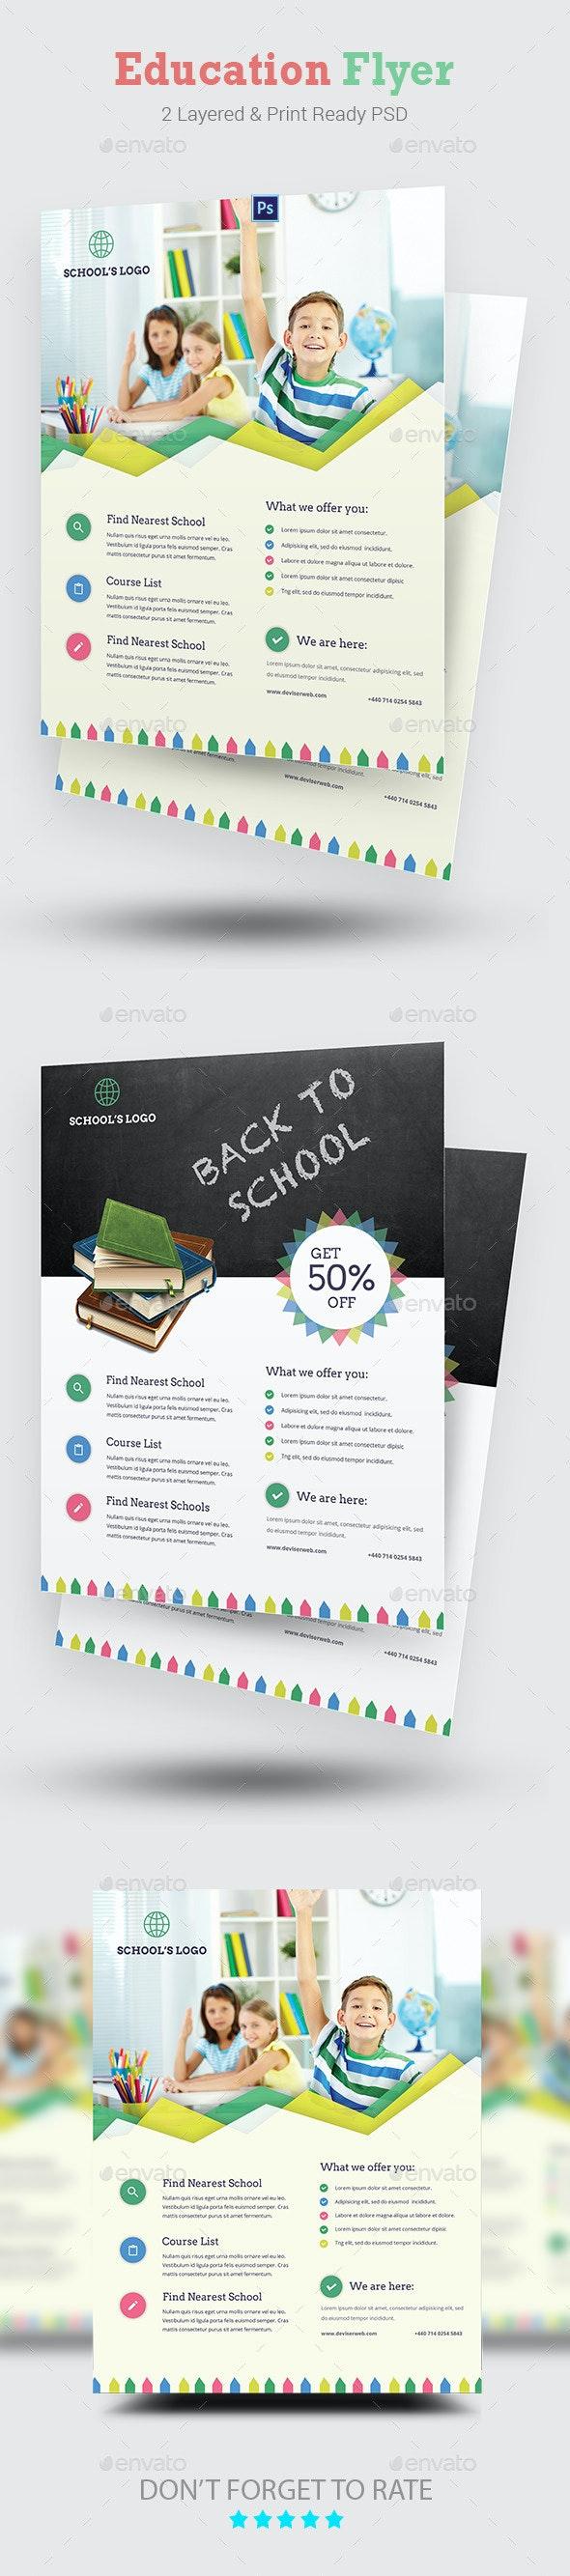 Education Flyer - Corporate Flyers